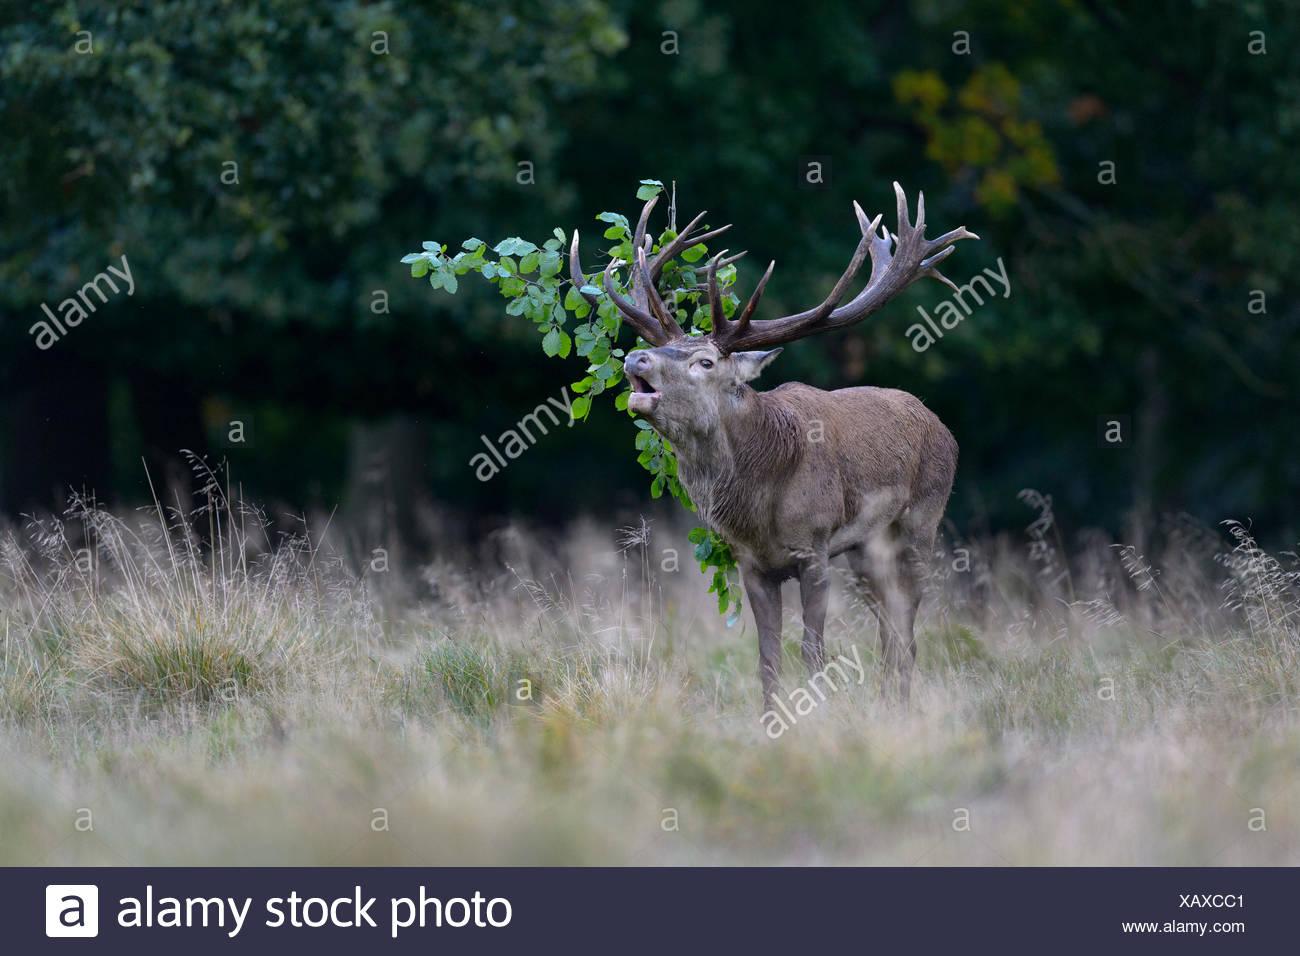 Red deer (Cervus elaphus), roaring, capital stag with foliage in the antler, Imponierge, Platzhirsch, Zealand, Denmark - Stock Image